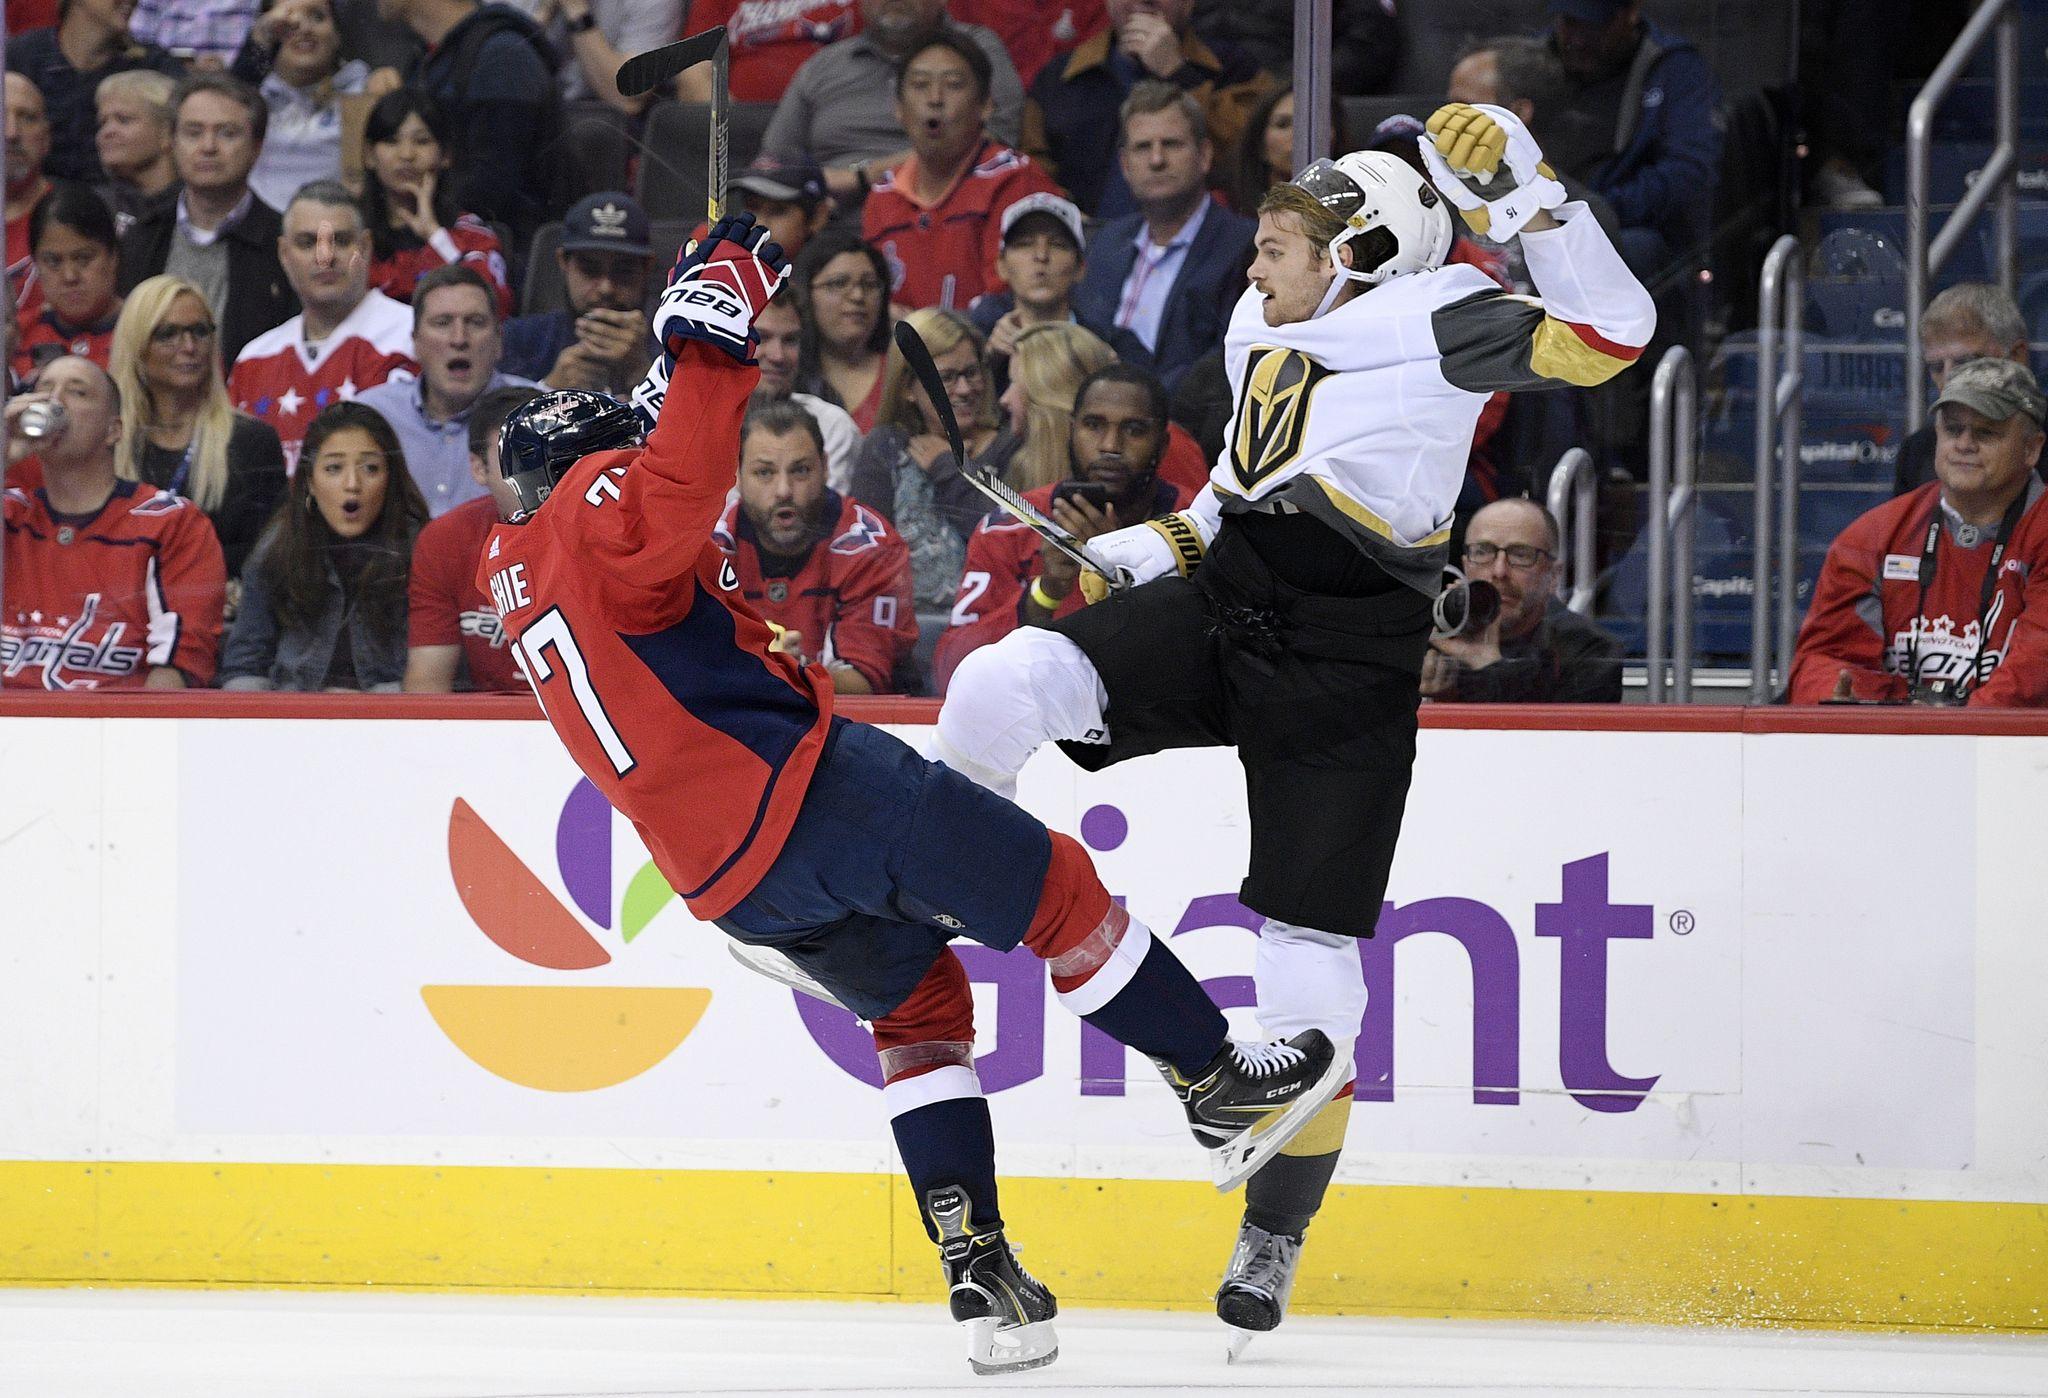 Golden_knights_capitals_hockey_06781.jpg-60d19_s2048x1398